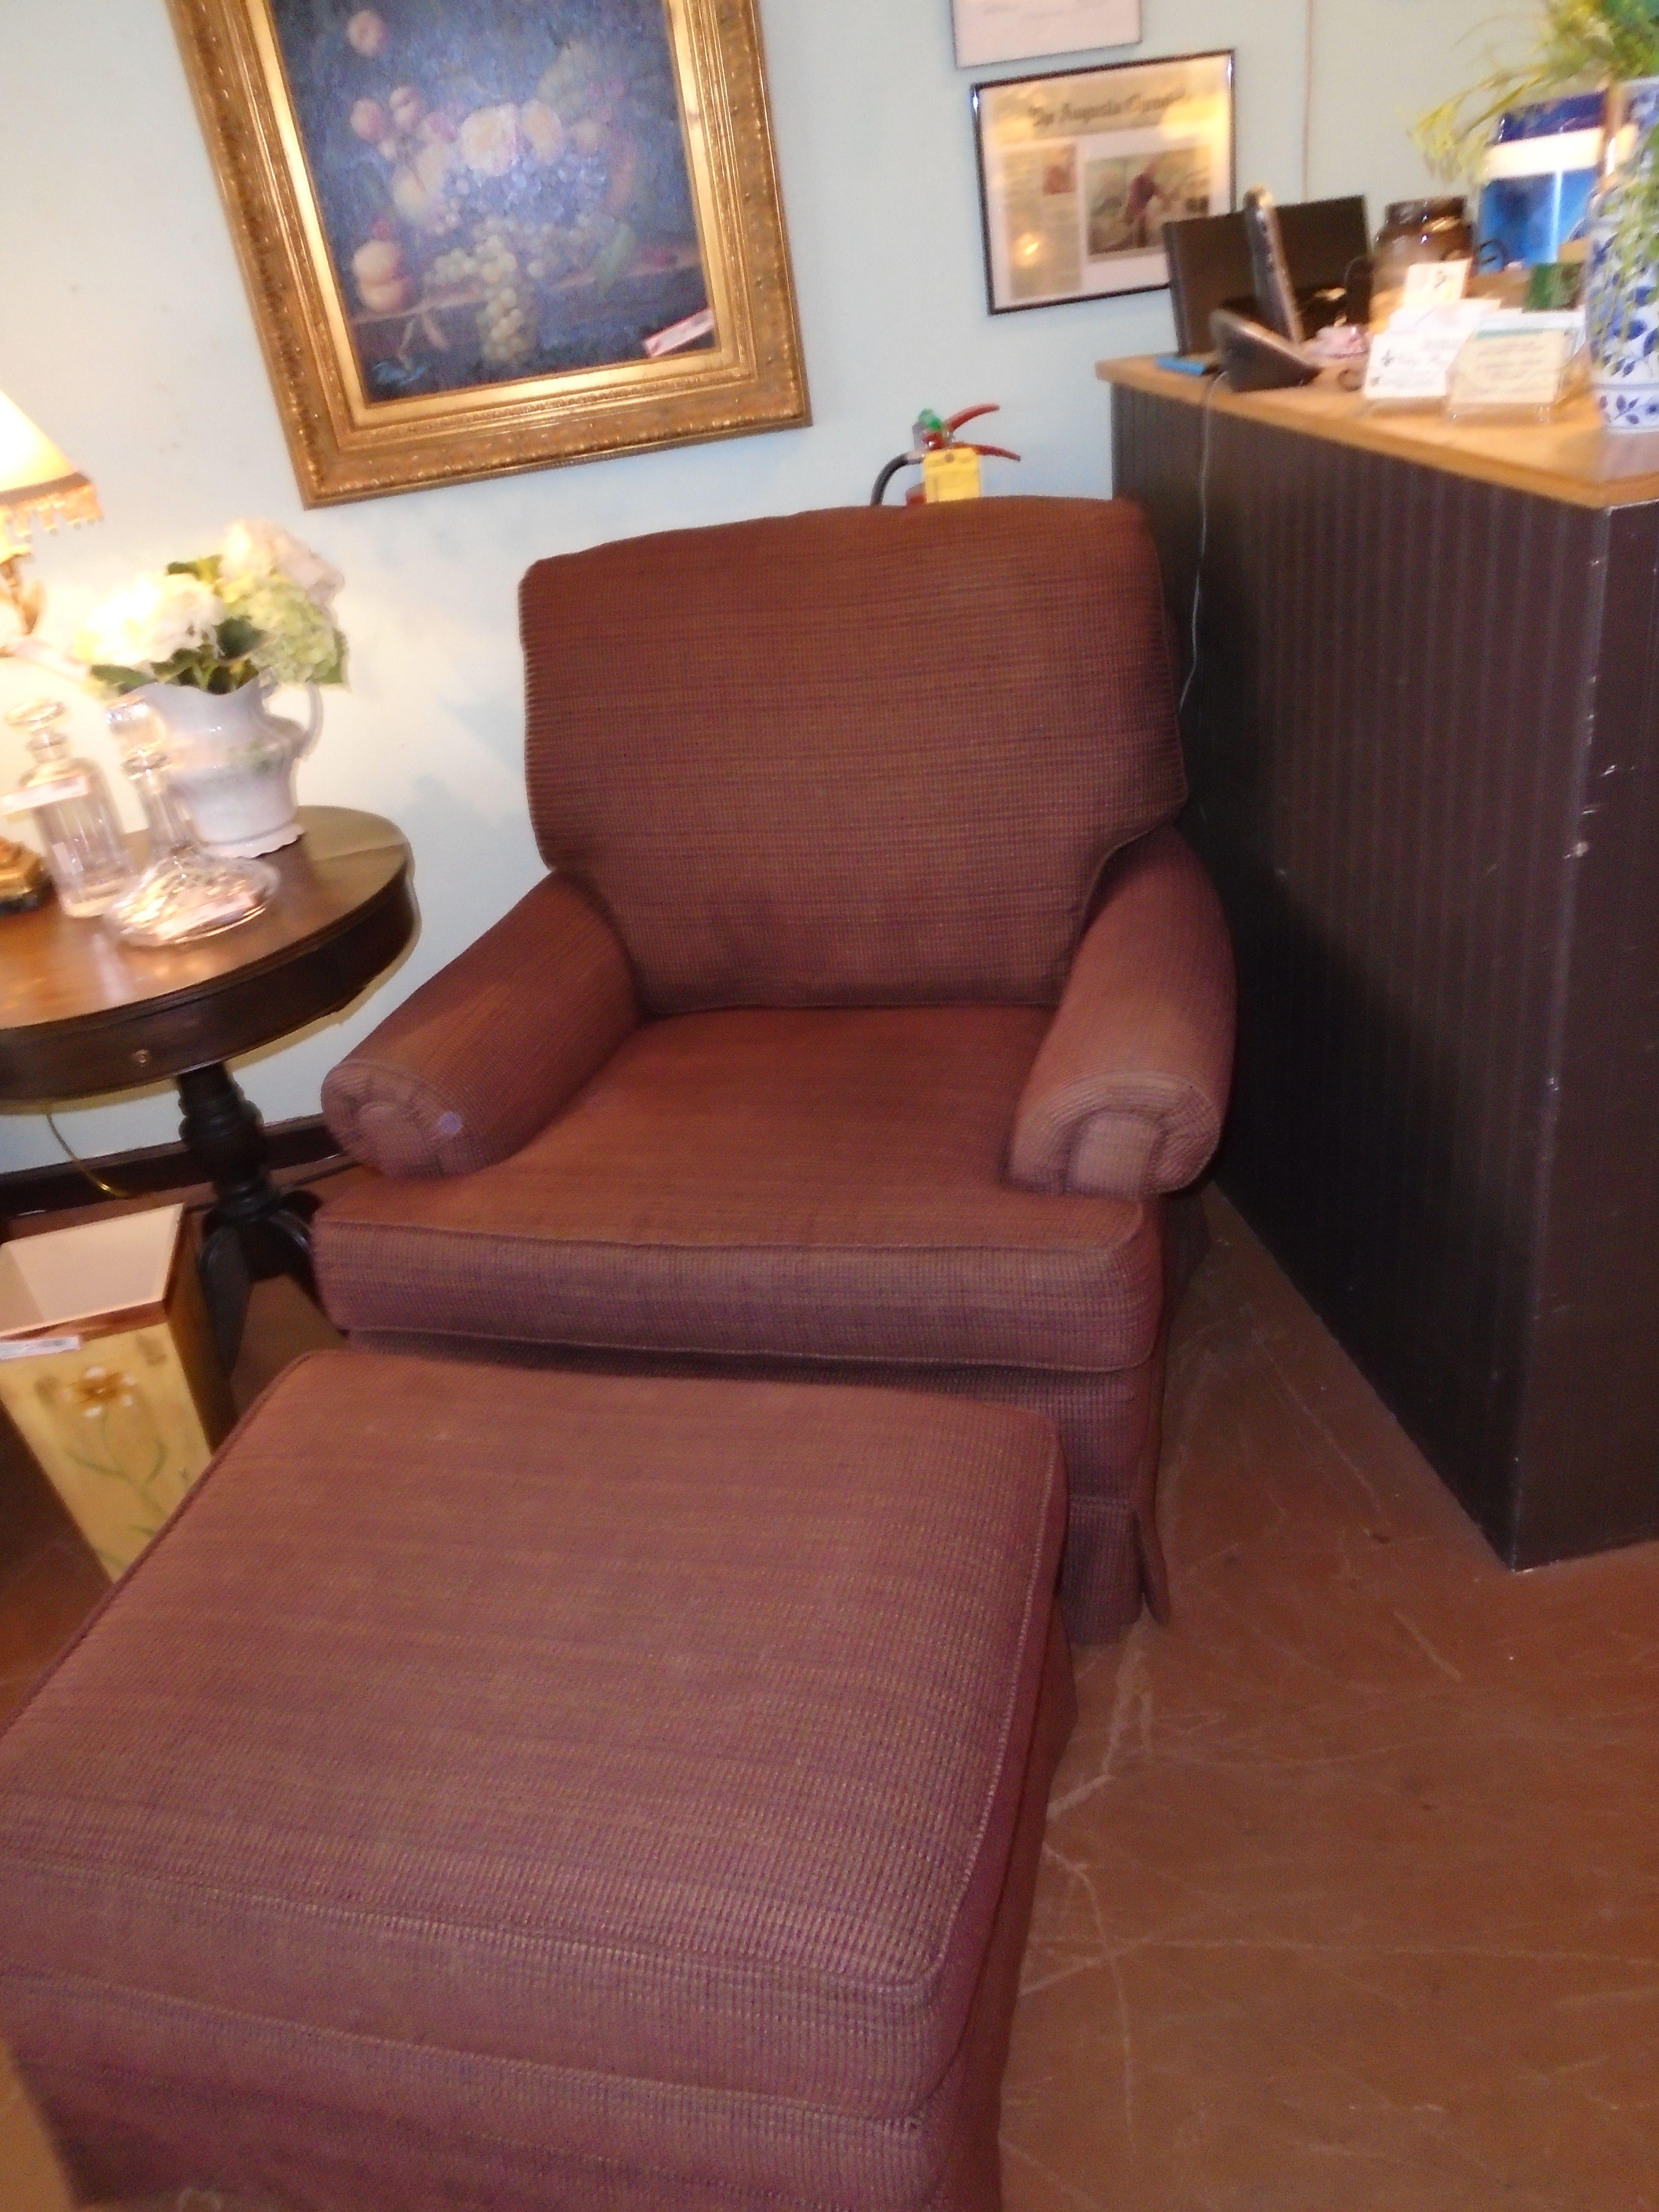 Woodmark Chair And Ottoman